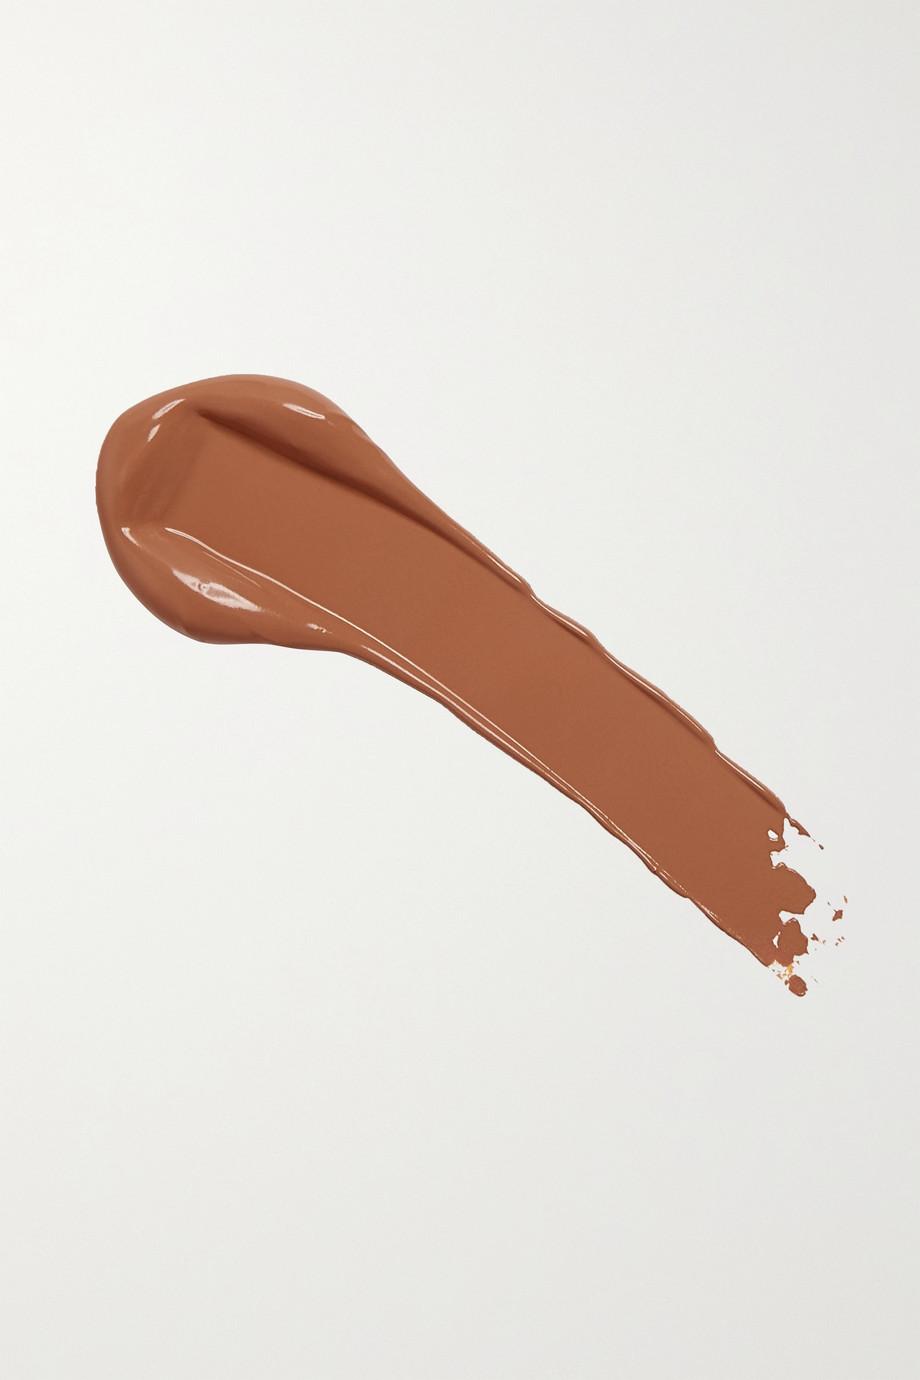 Huda Beauty FauxFilter Luminous Matte Liquid Foundation - Cinnamon 440G, 35ml